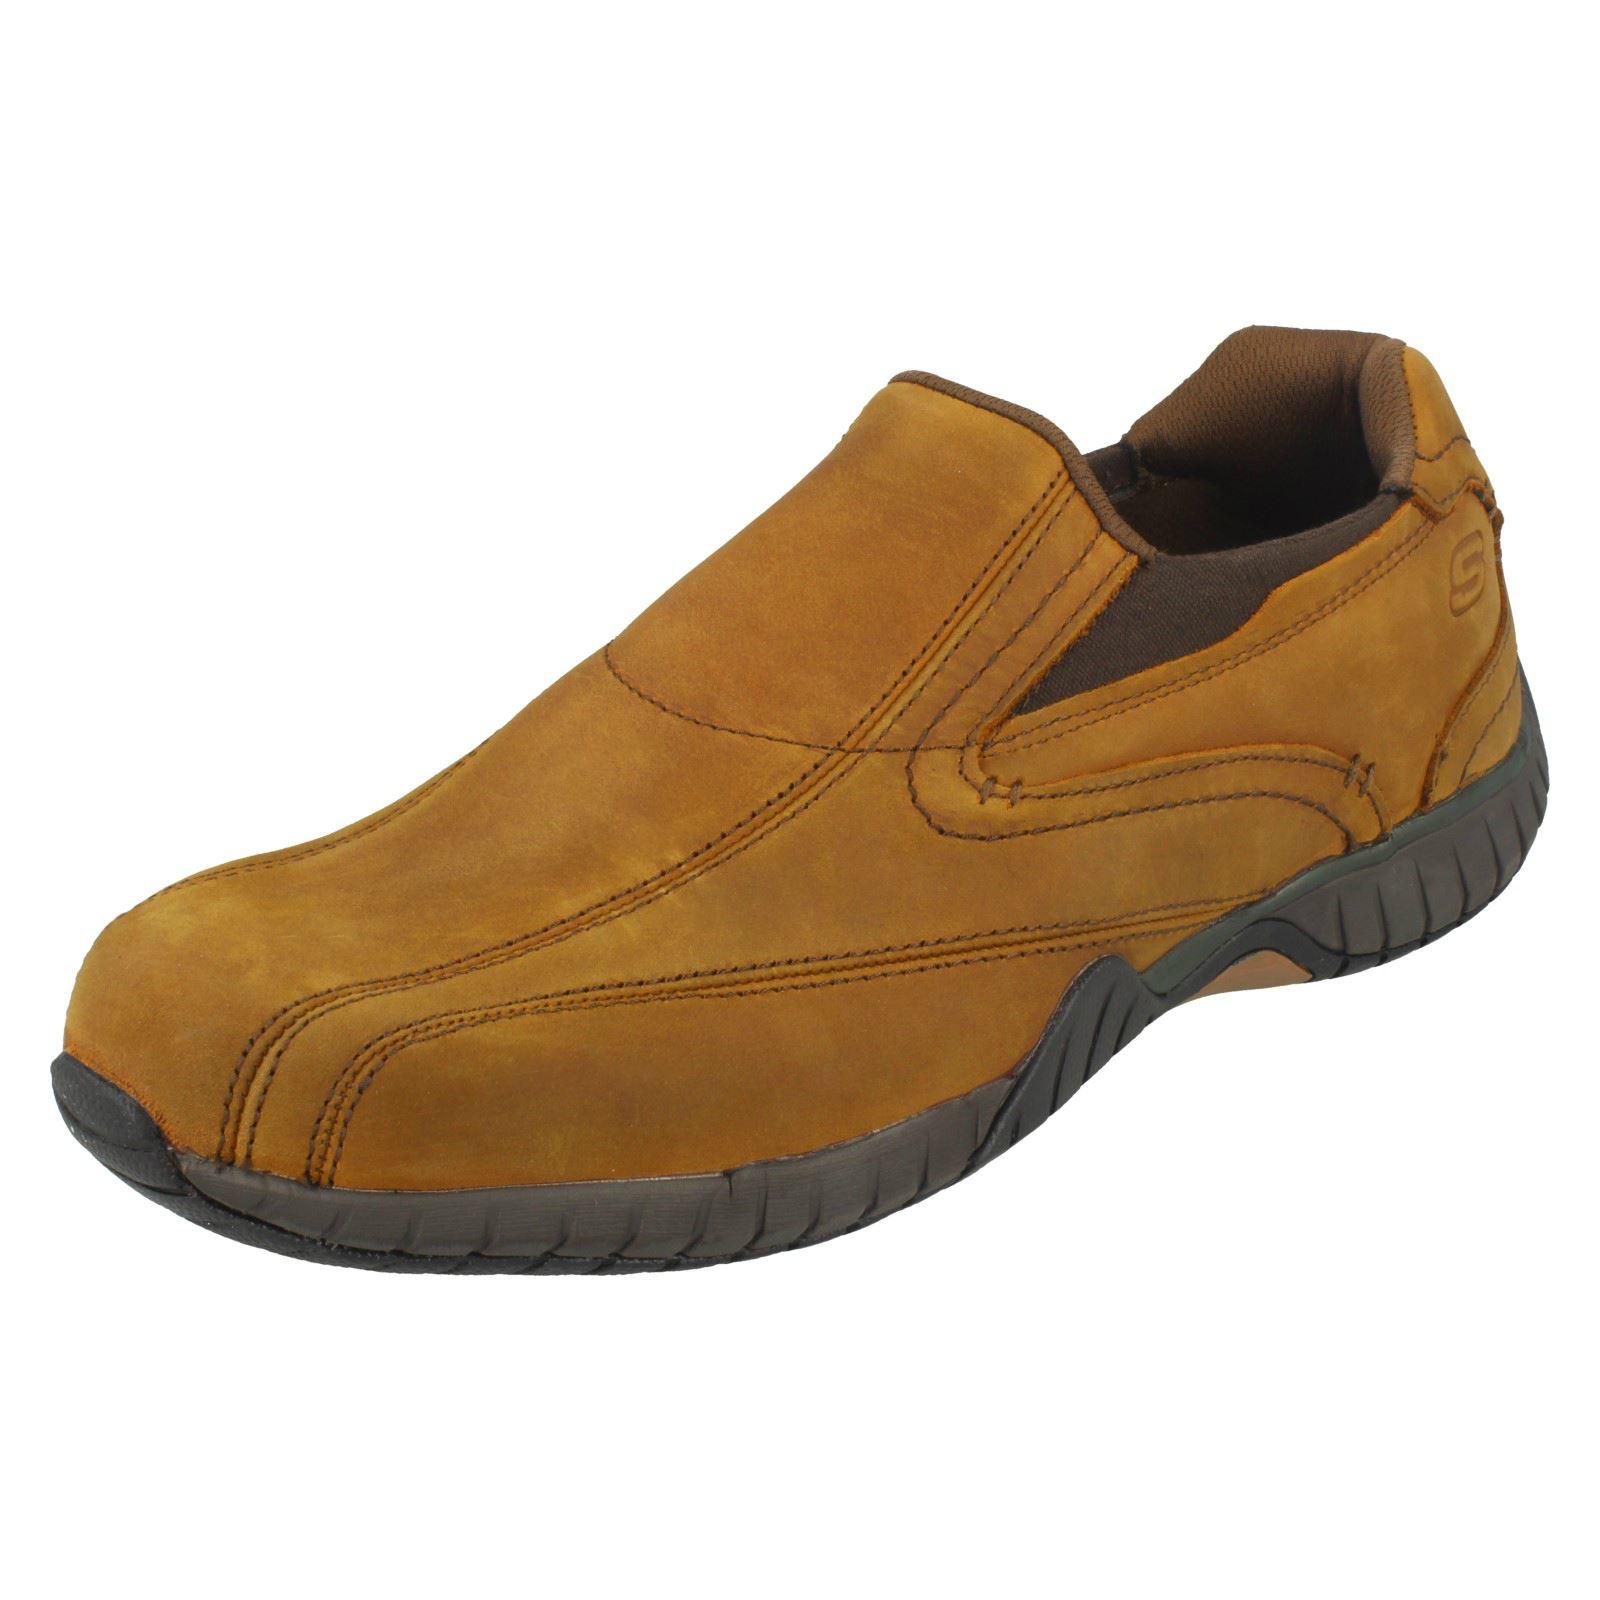 Zapatos Skechers Ebay De Diario Hombre 65287 Sendro Bascom BR7w4q